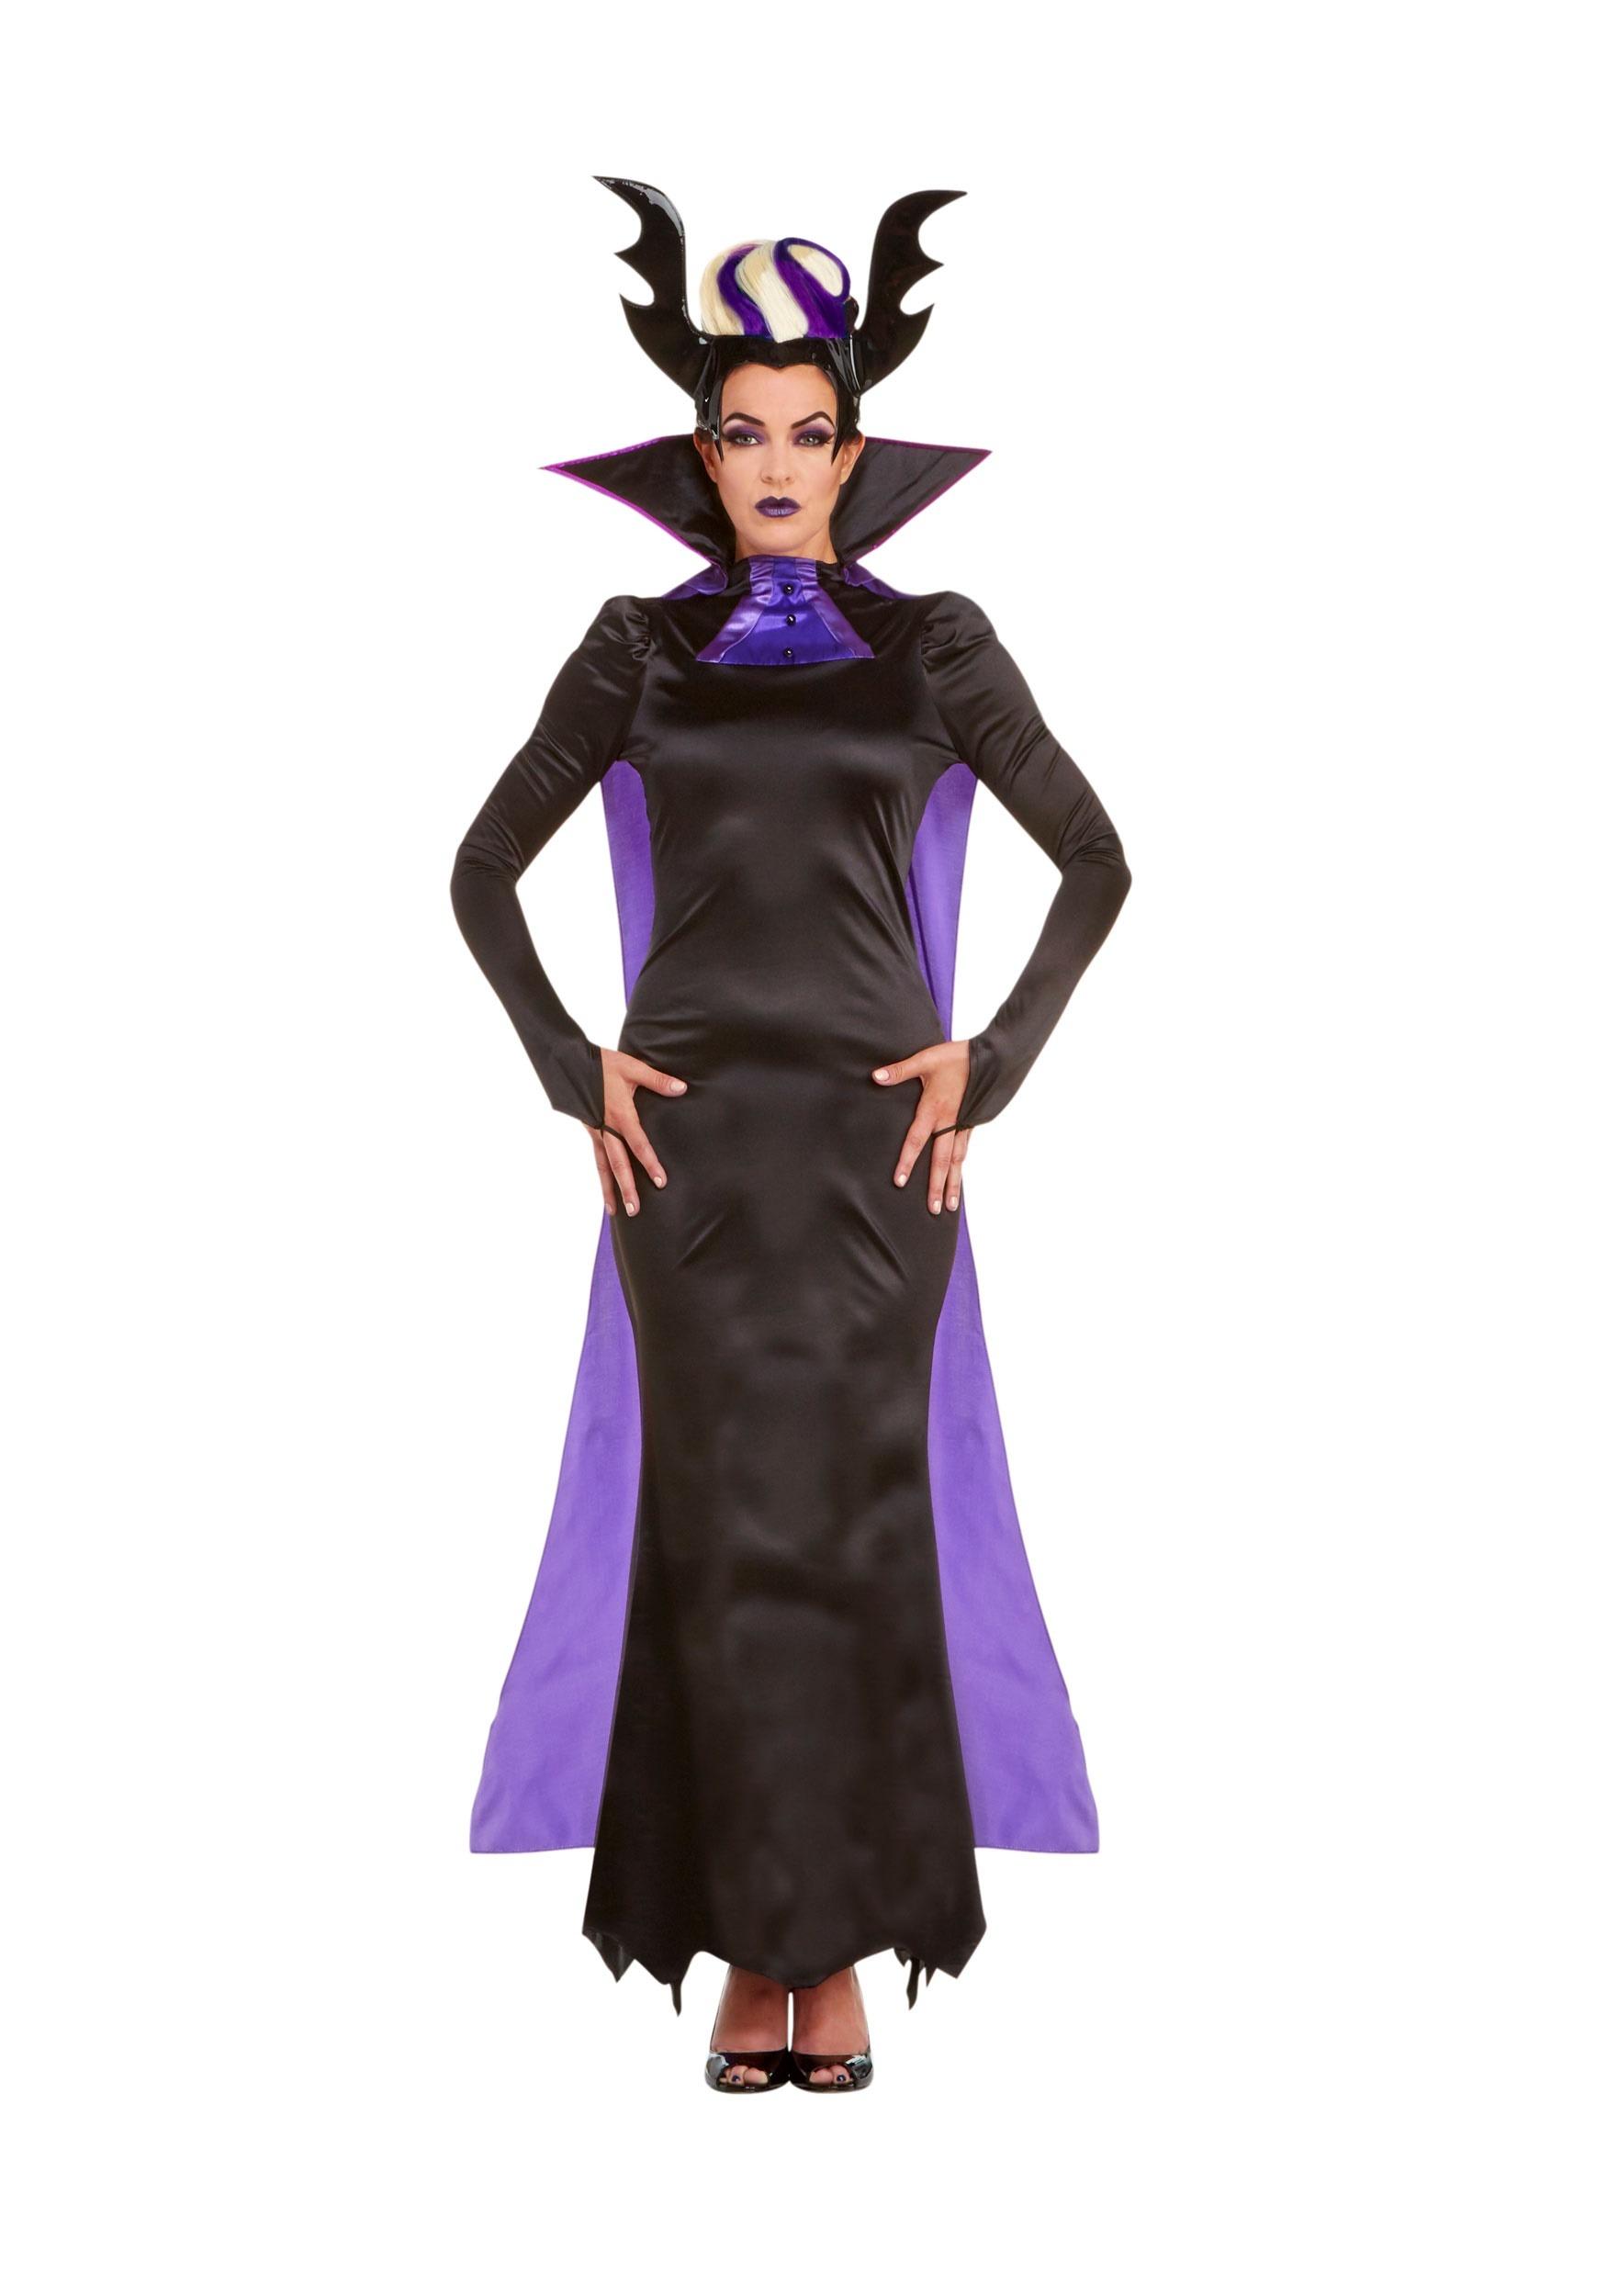 Mavis Halloween Costume Toddler.Hotel Transylvania Costumes Halloweencostumes Com